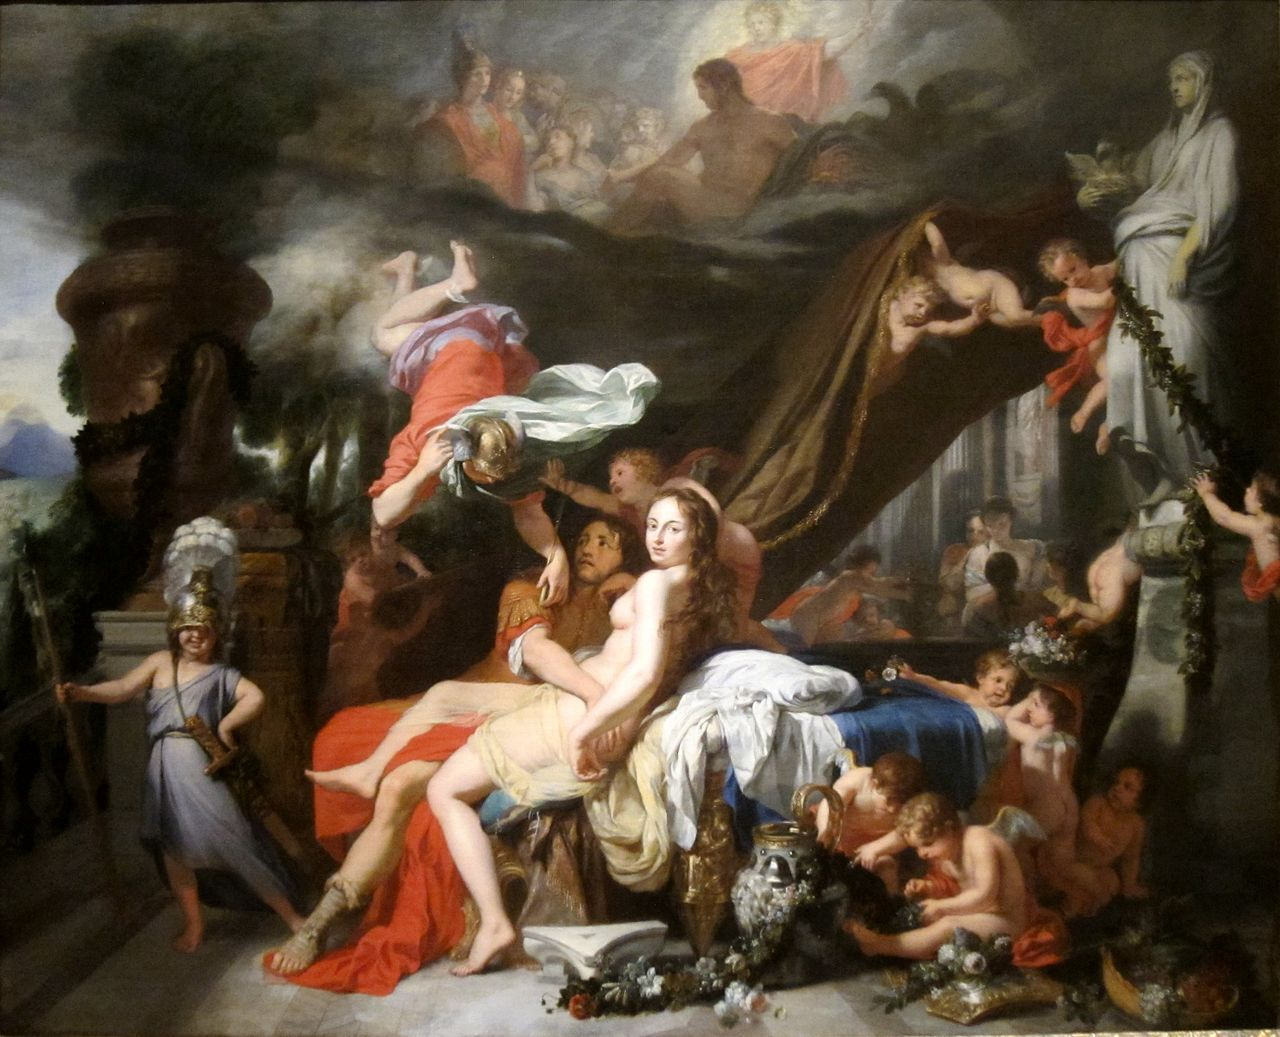 Hermes_Ordering_Calypso_to_Release_Odysseus'_by_Gerard_de_Lairesse,_c._1670